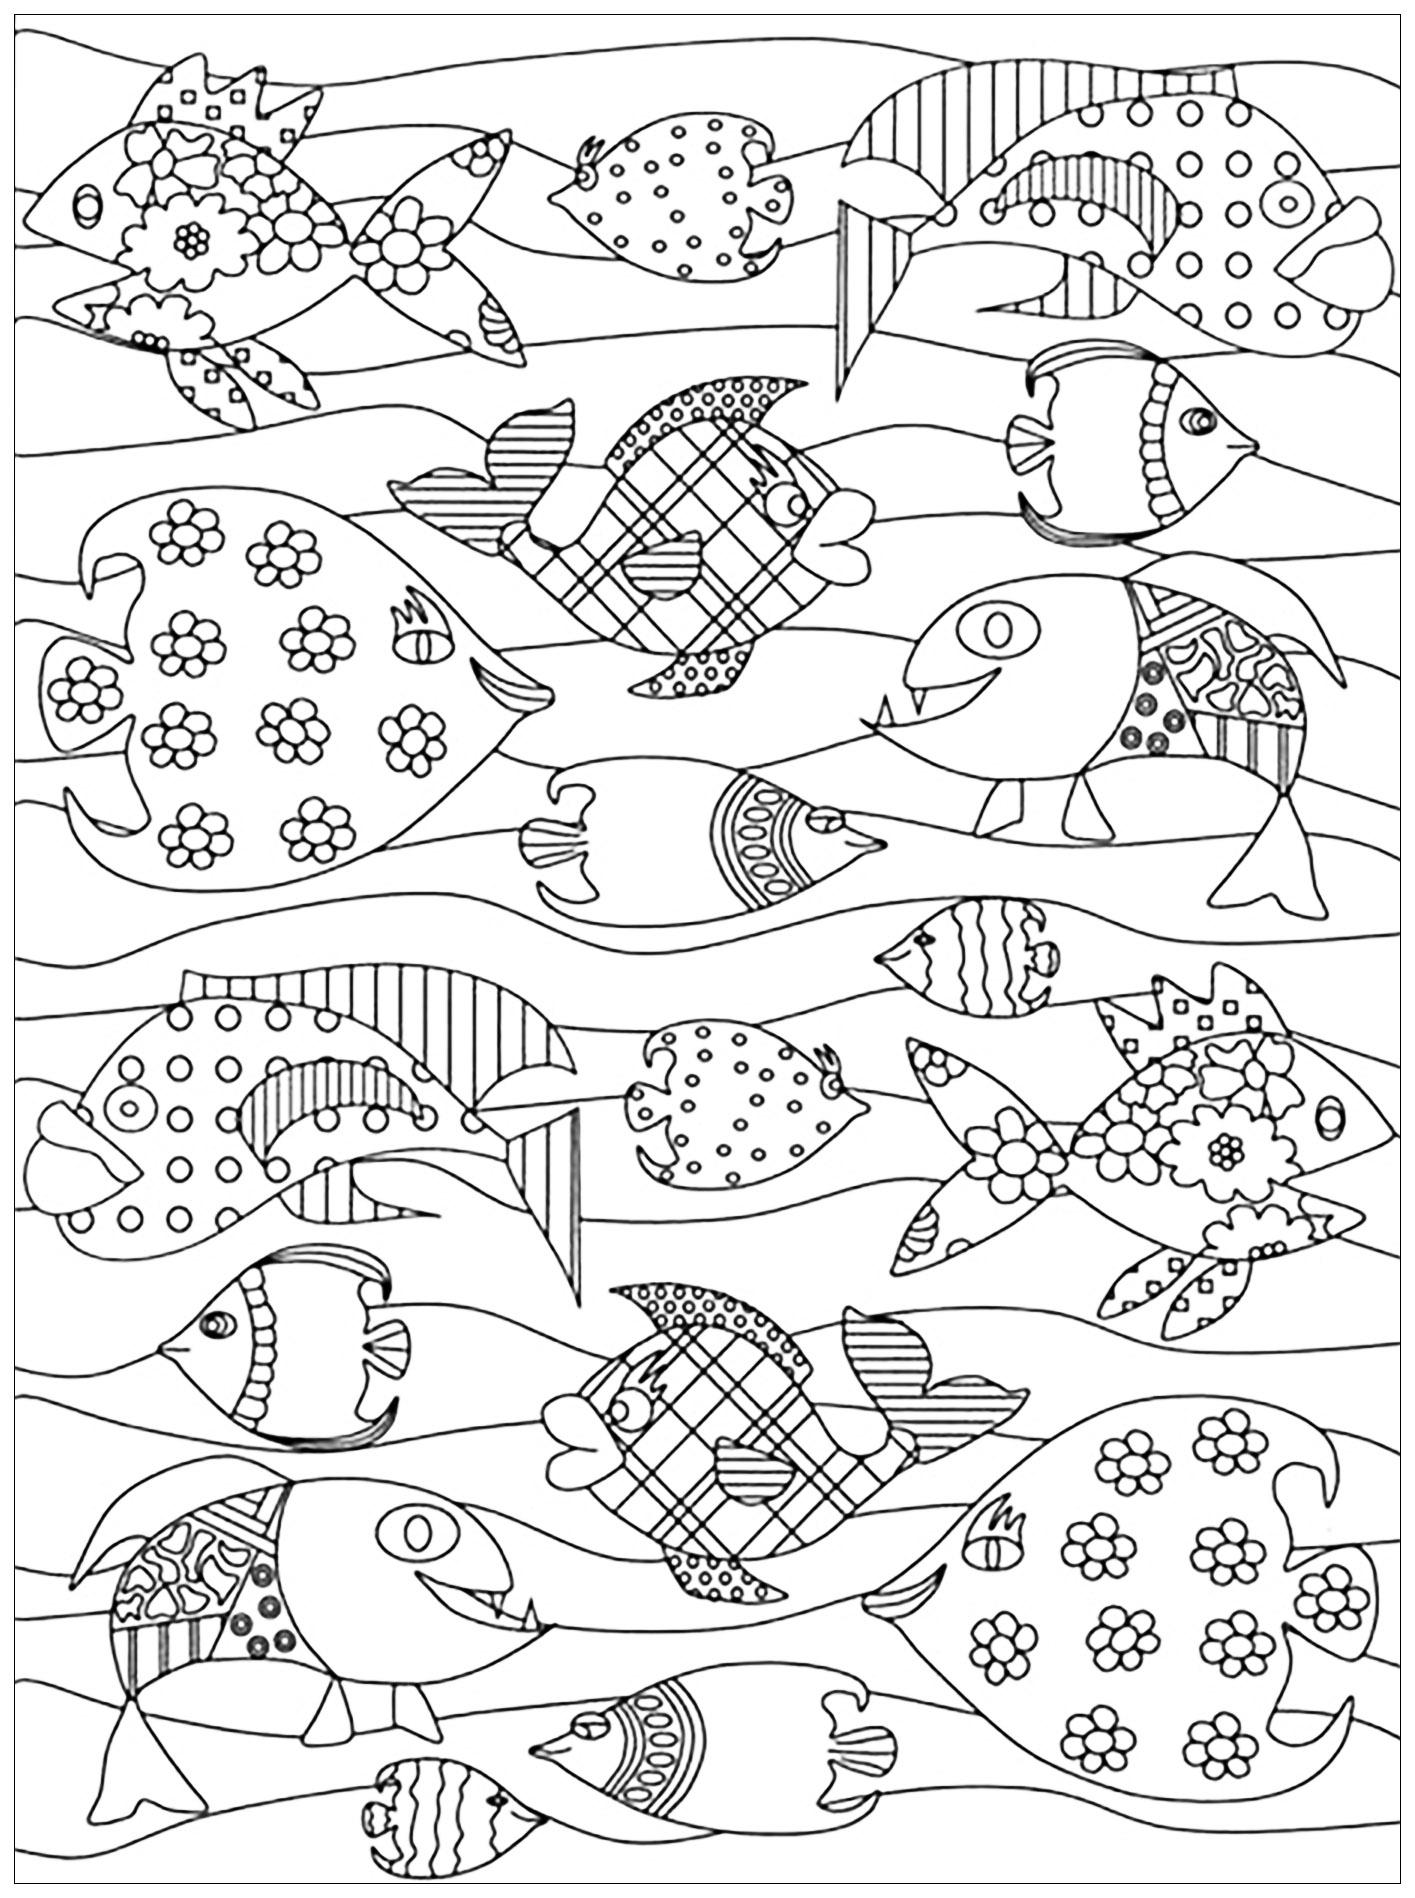 Pesci 36493 Pesci Disegni Da Colorare Per Adulti